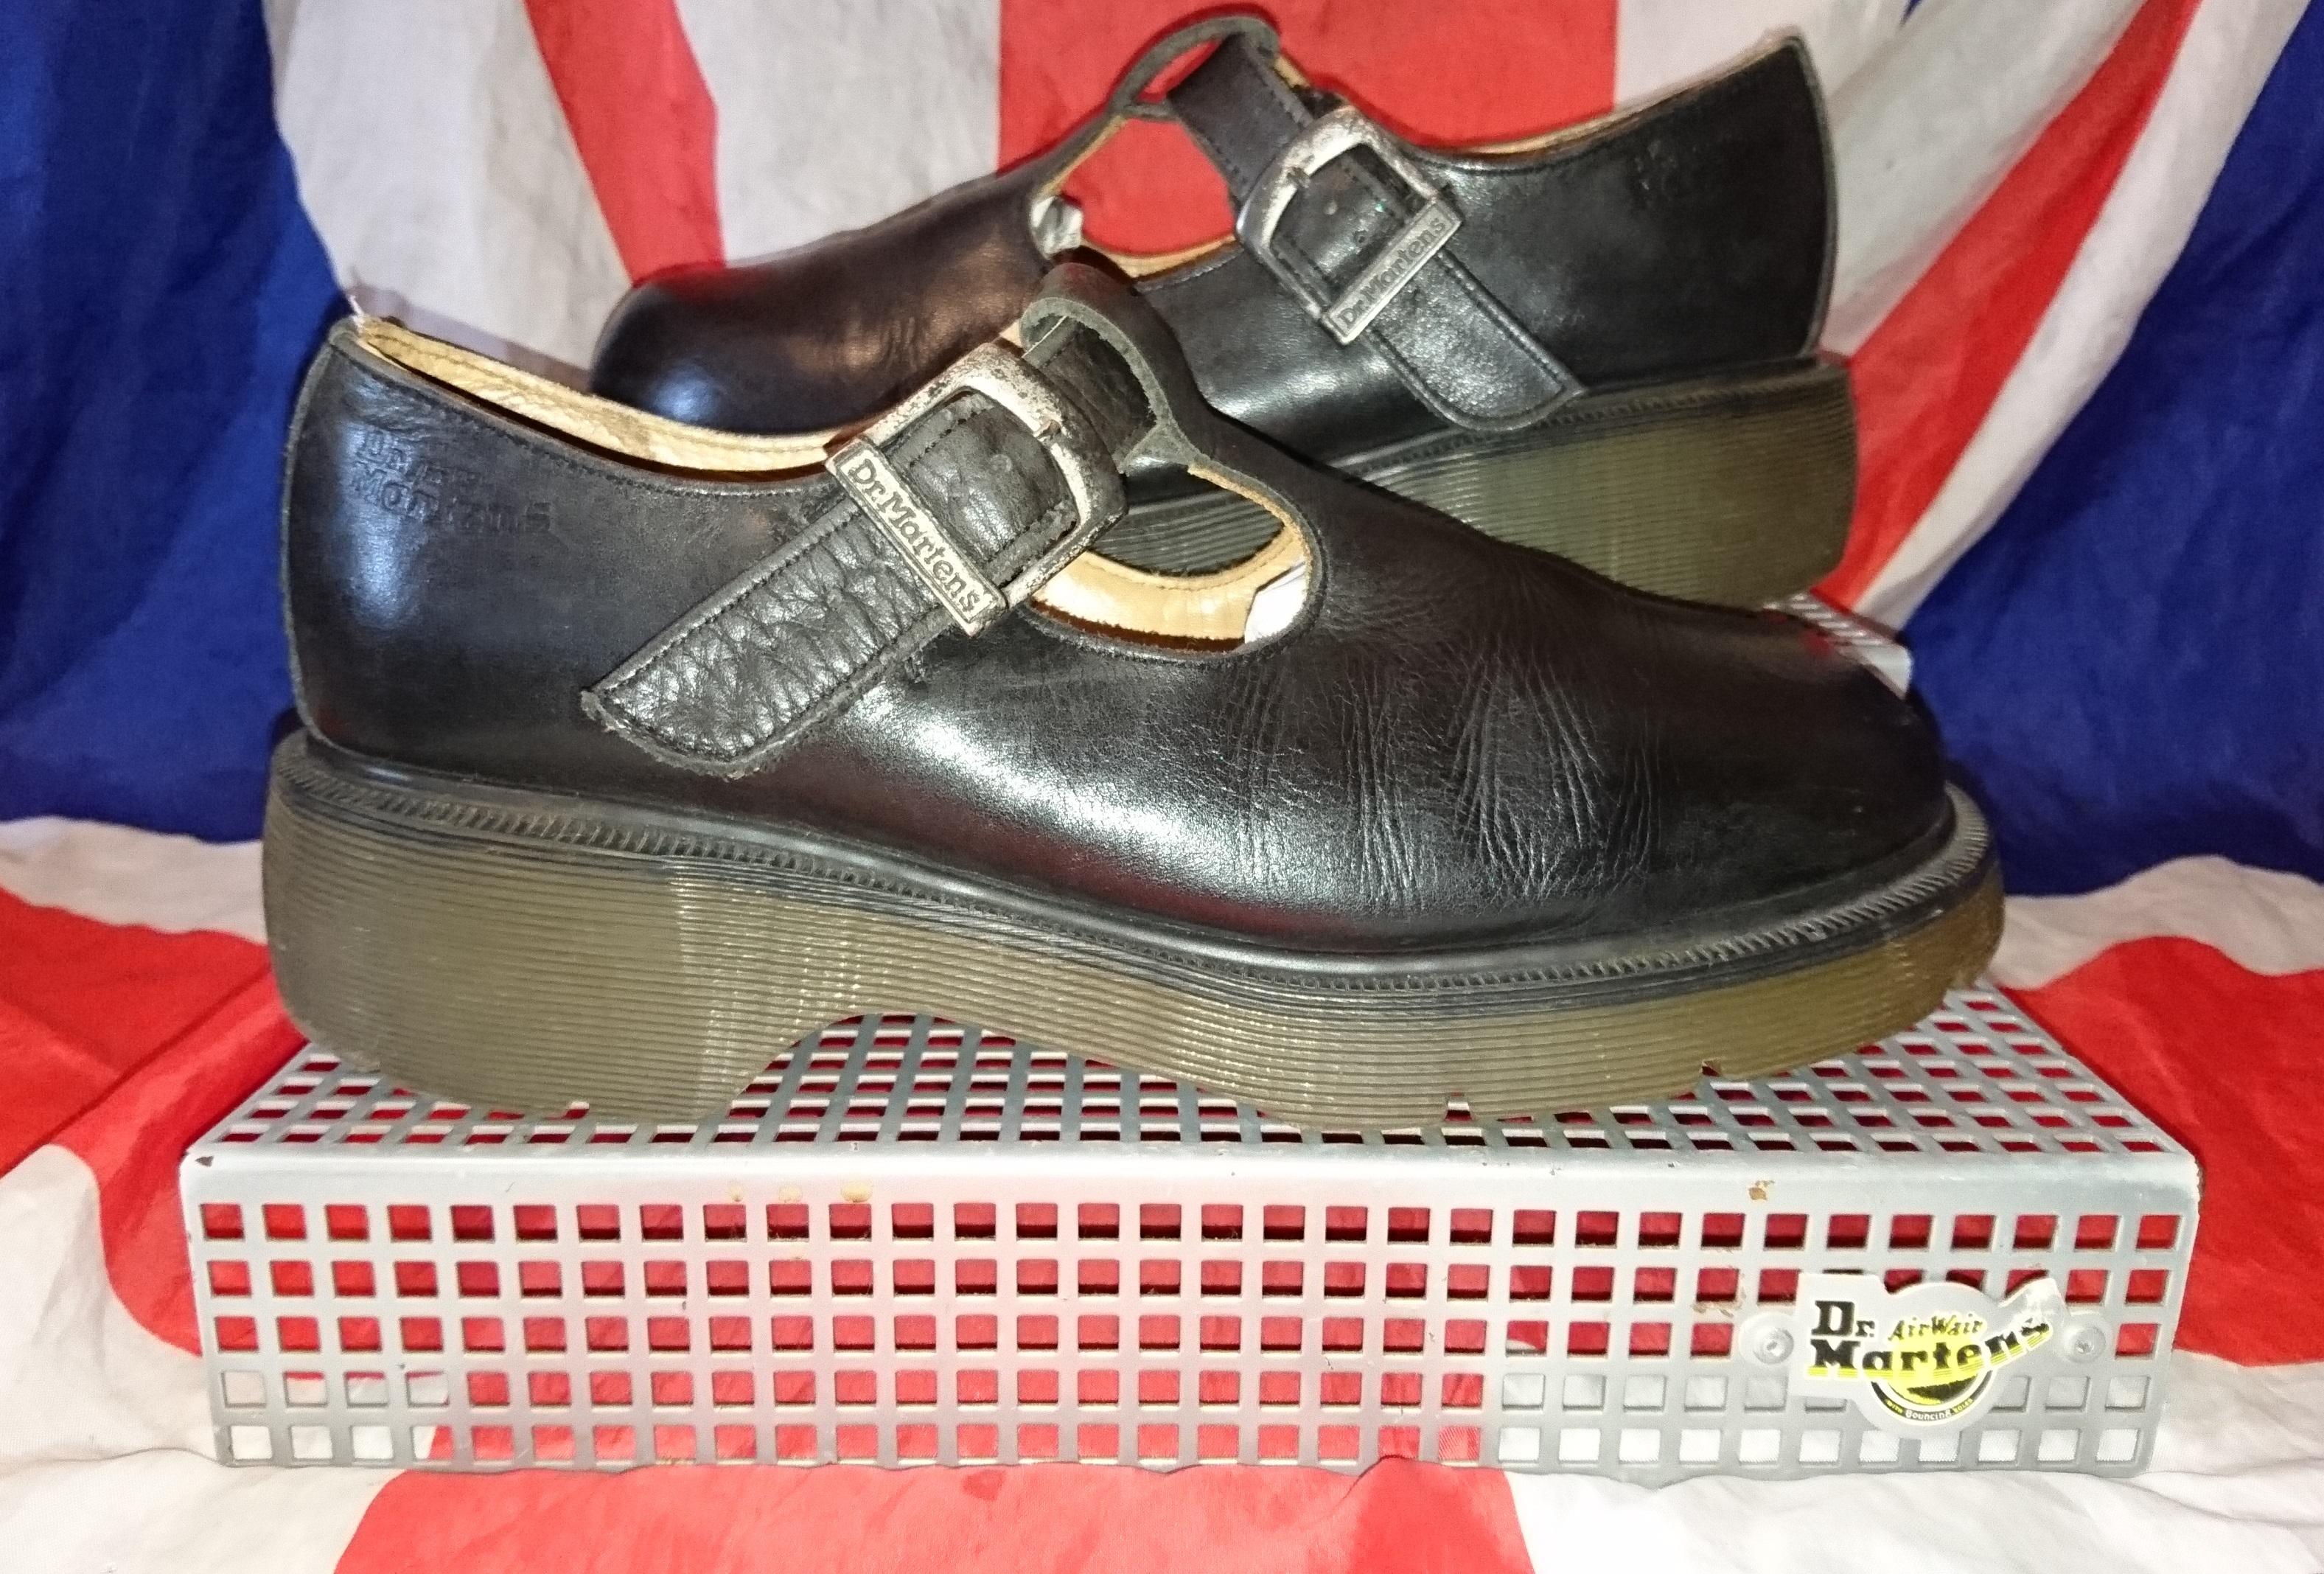 45eadfd116f96 England Vintage - Black T Bar Dr Doc Martens Chunky Mary Jane Shoes - UK  7*EU 41*USL 9 from Digital Docs